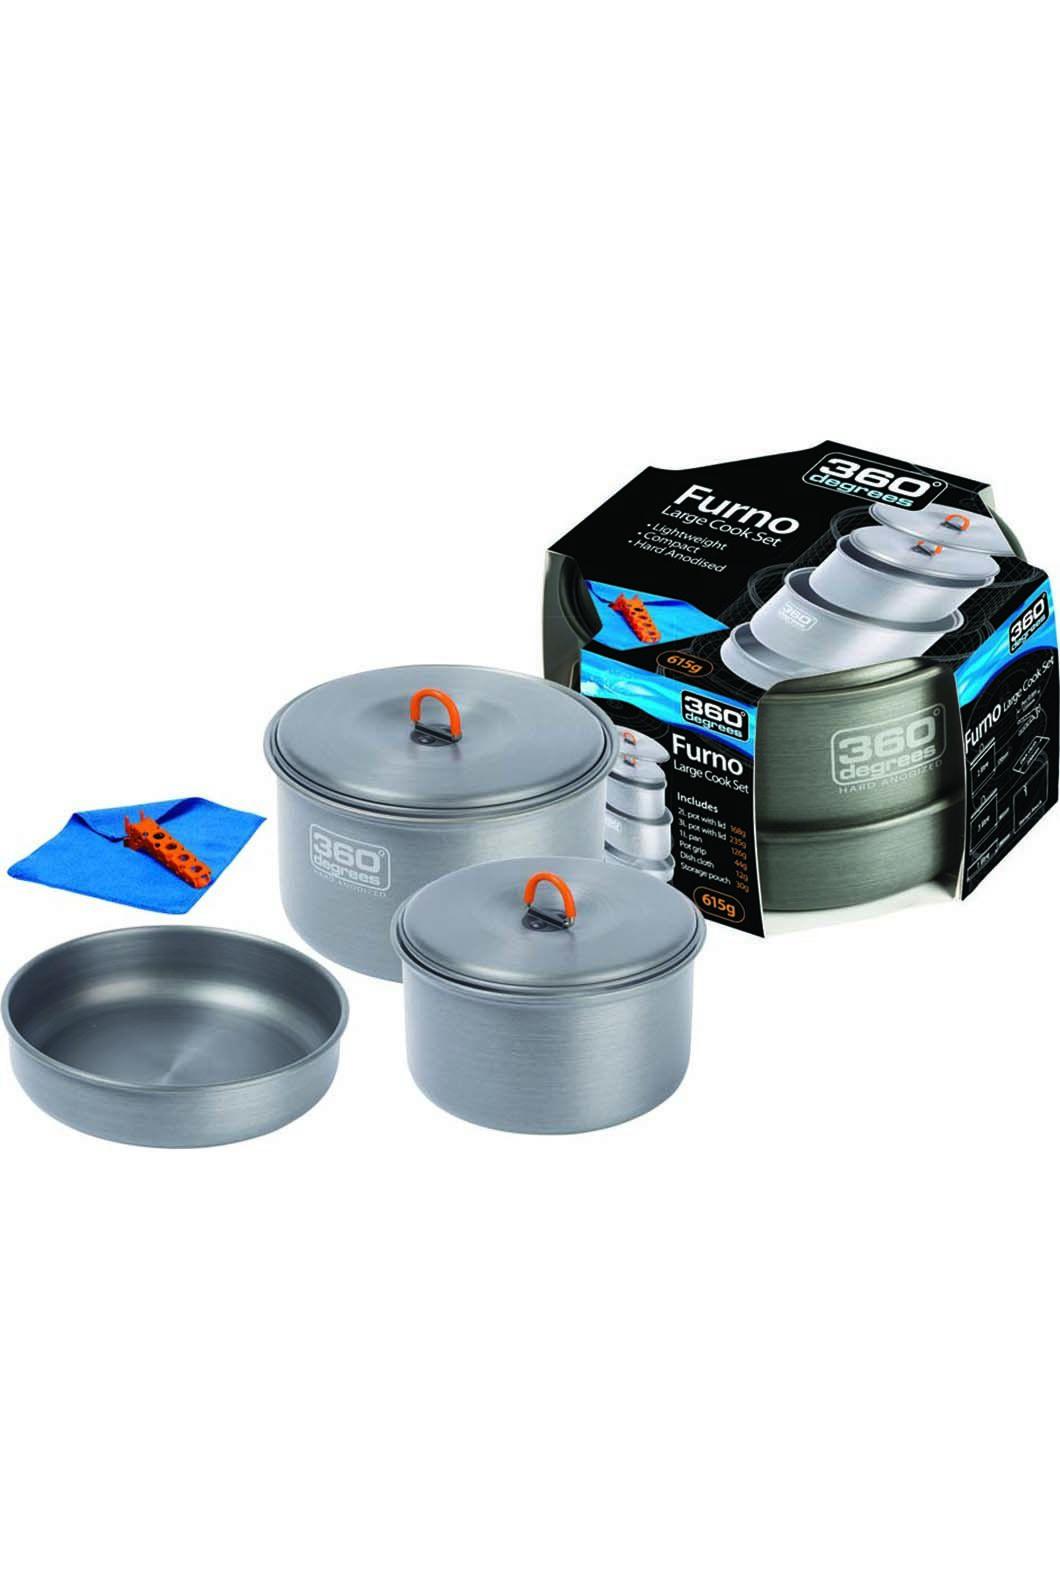 360 Degrees Furno Large Cooking Set, None, hi-res